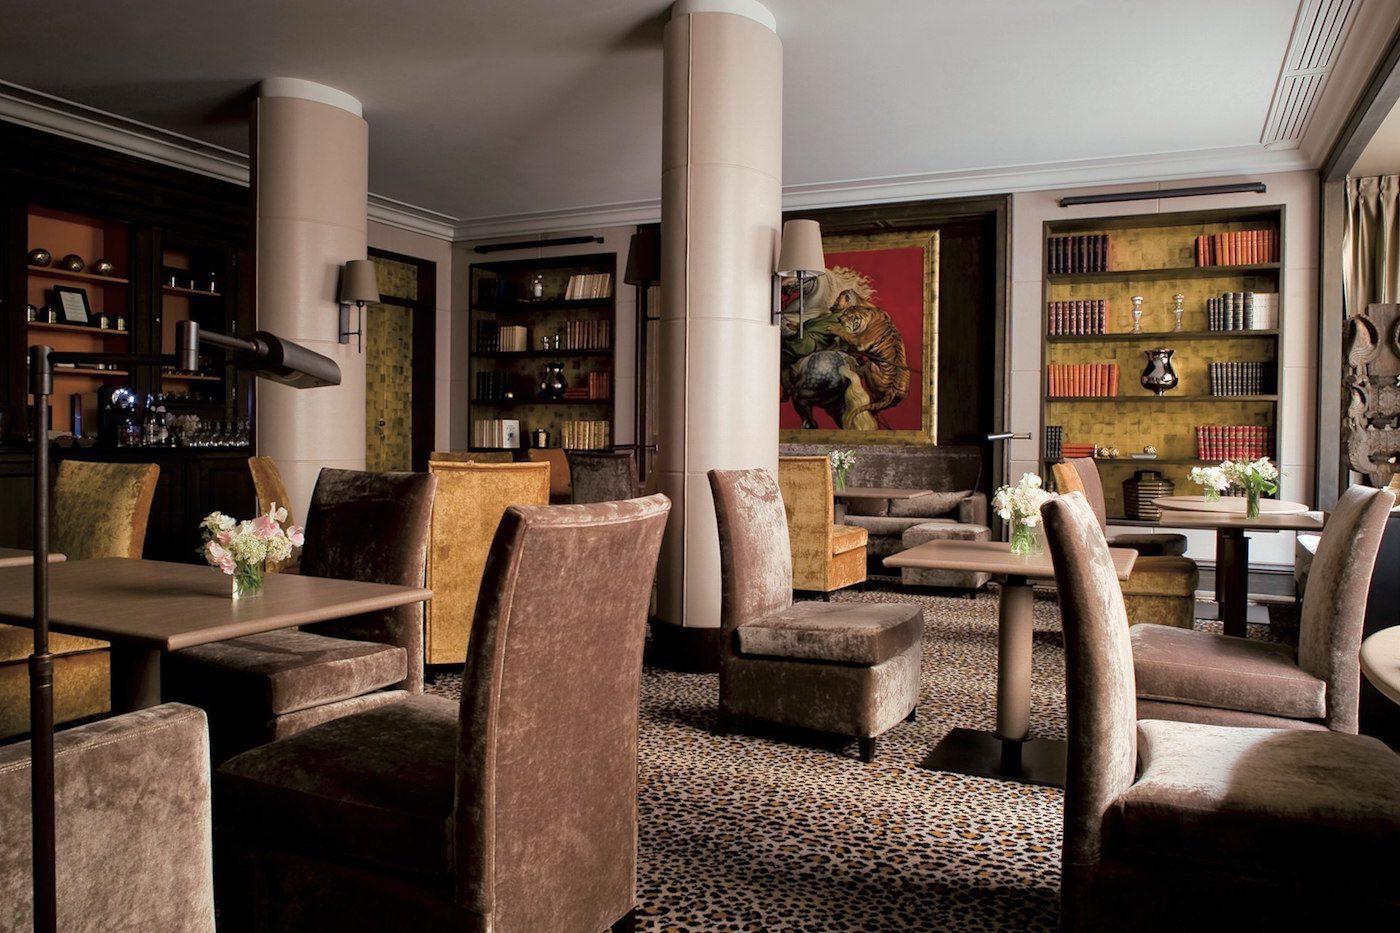 9 Characteristics of Boutique Hotels